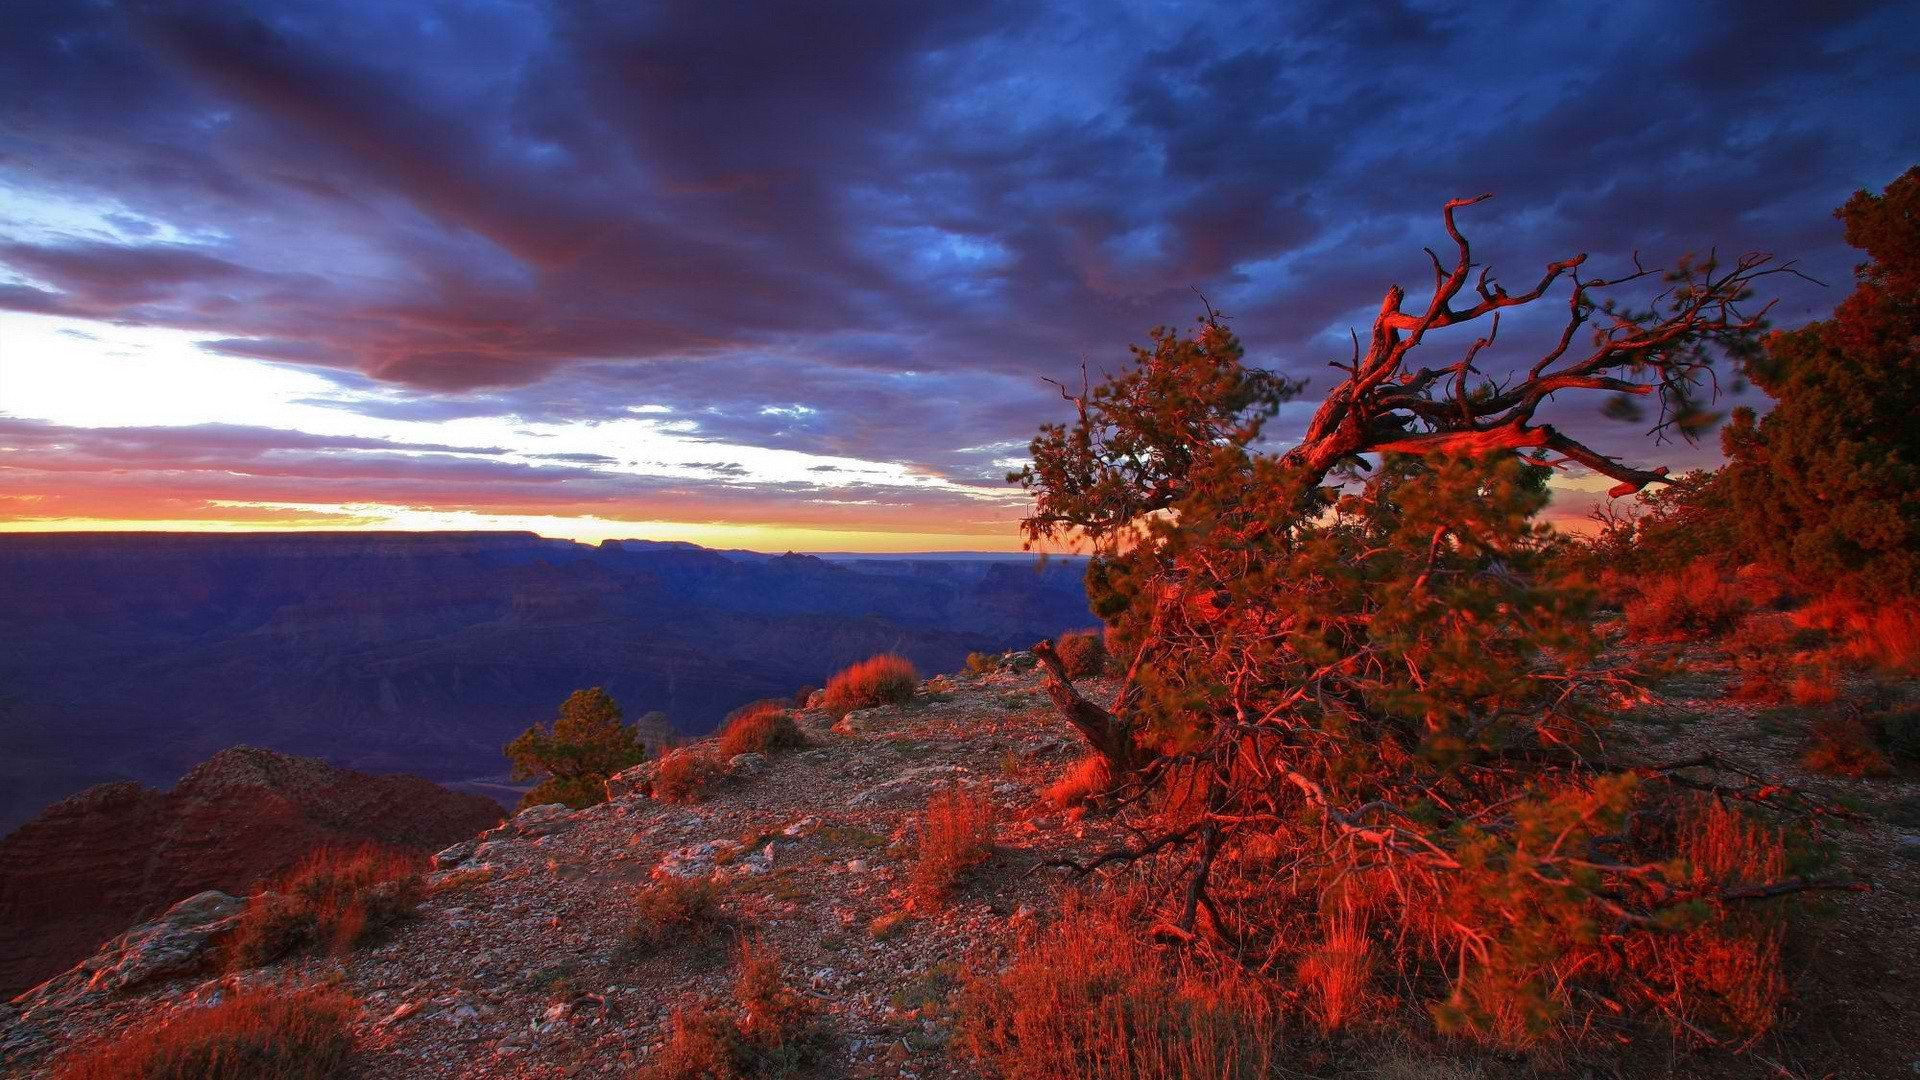 wallpaper sunset mountain arizona - photo #48